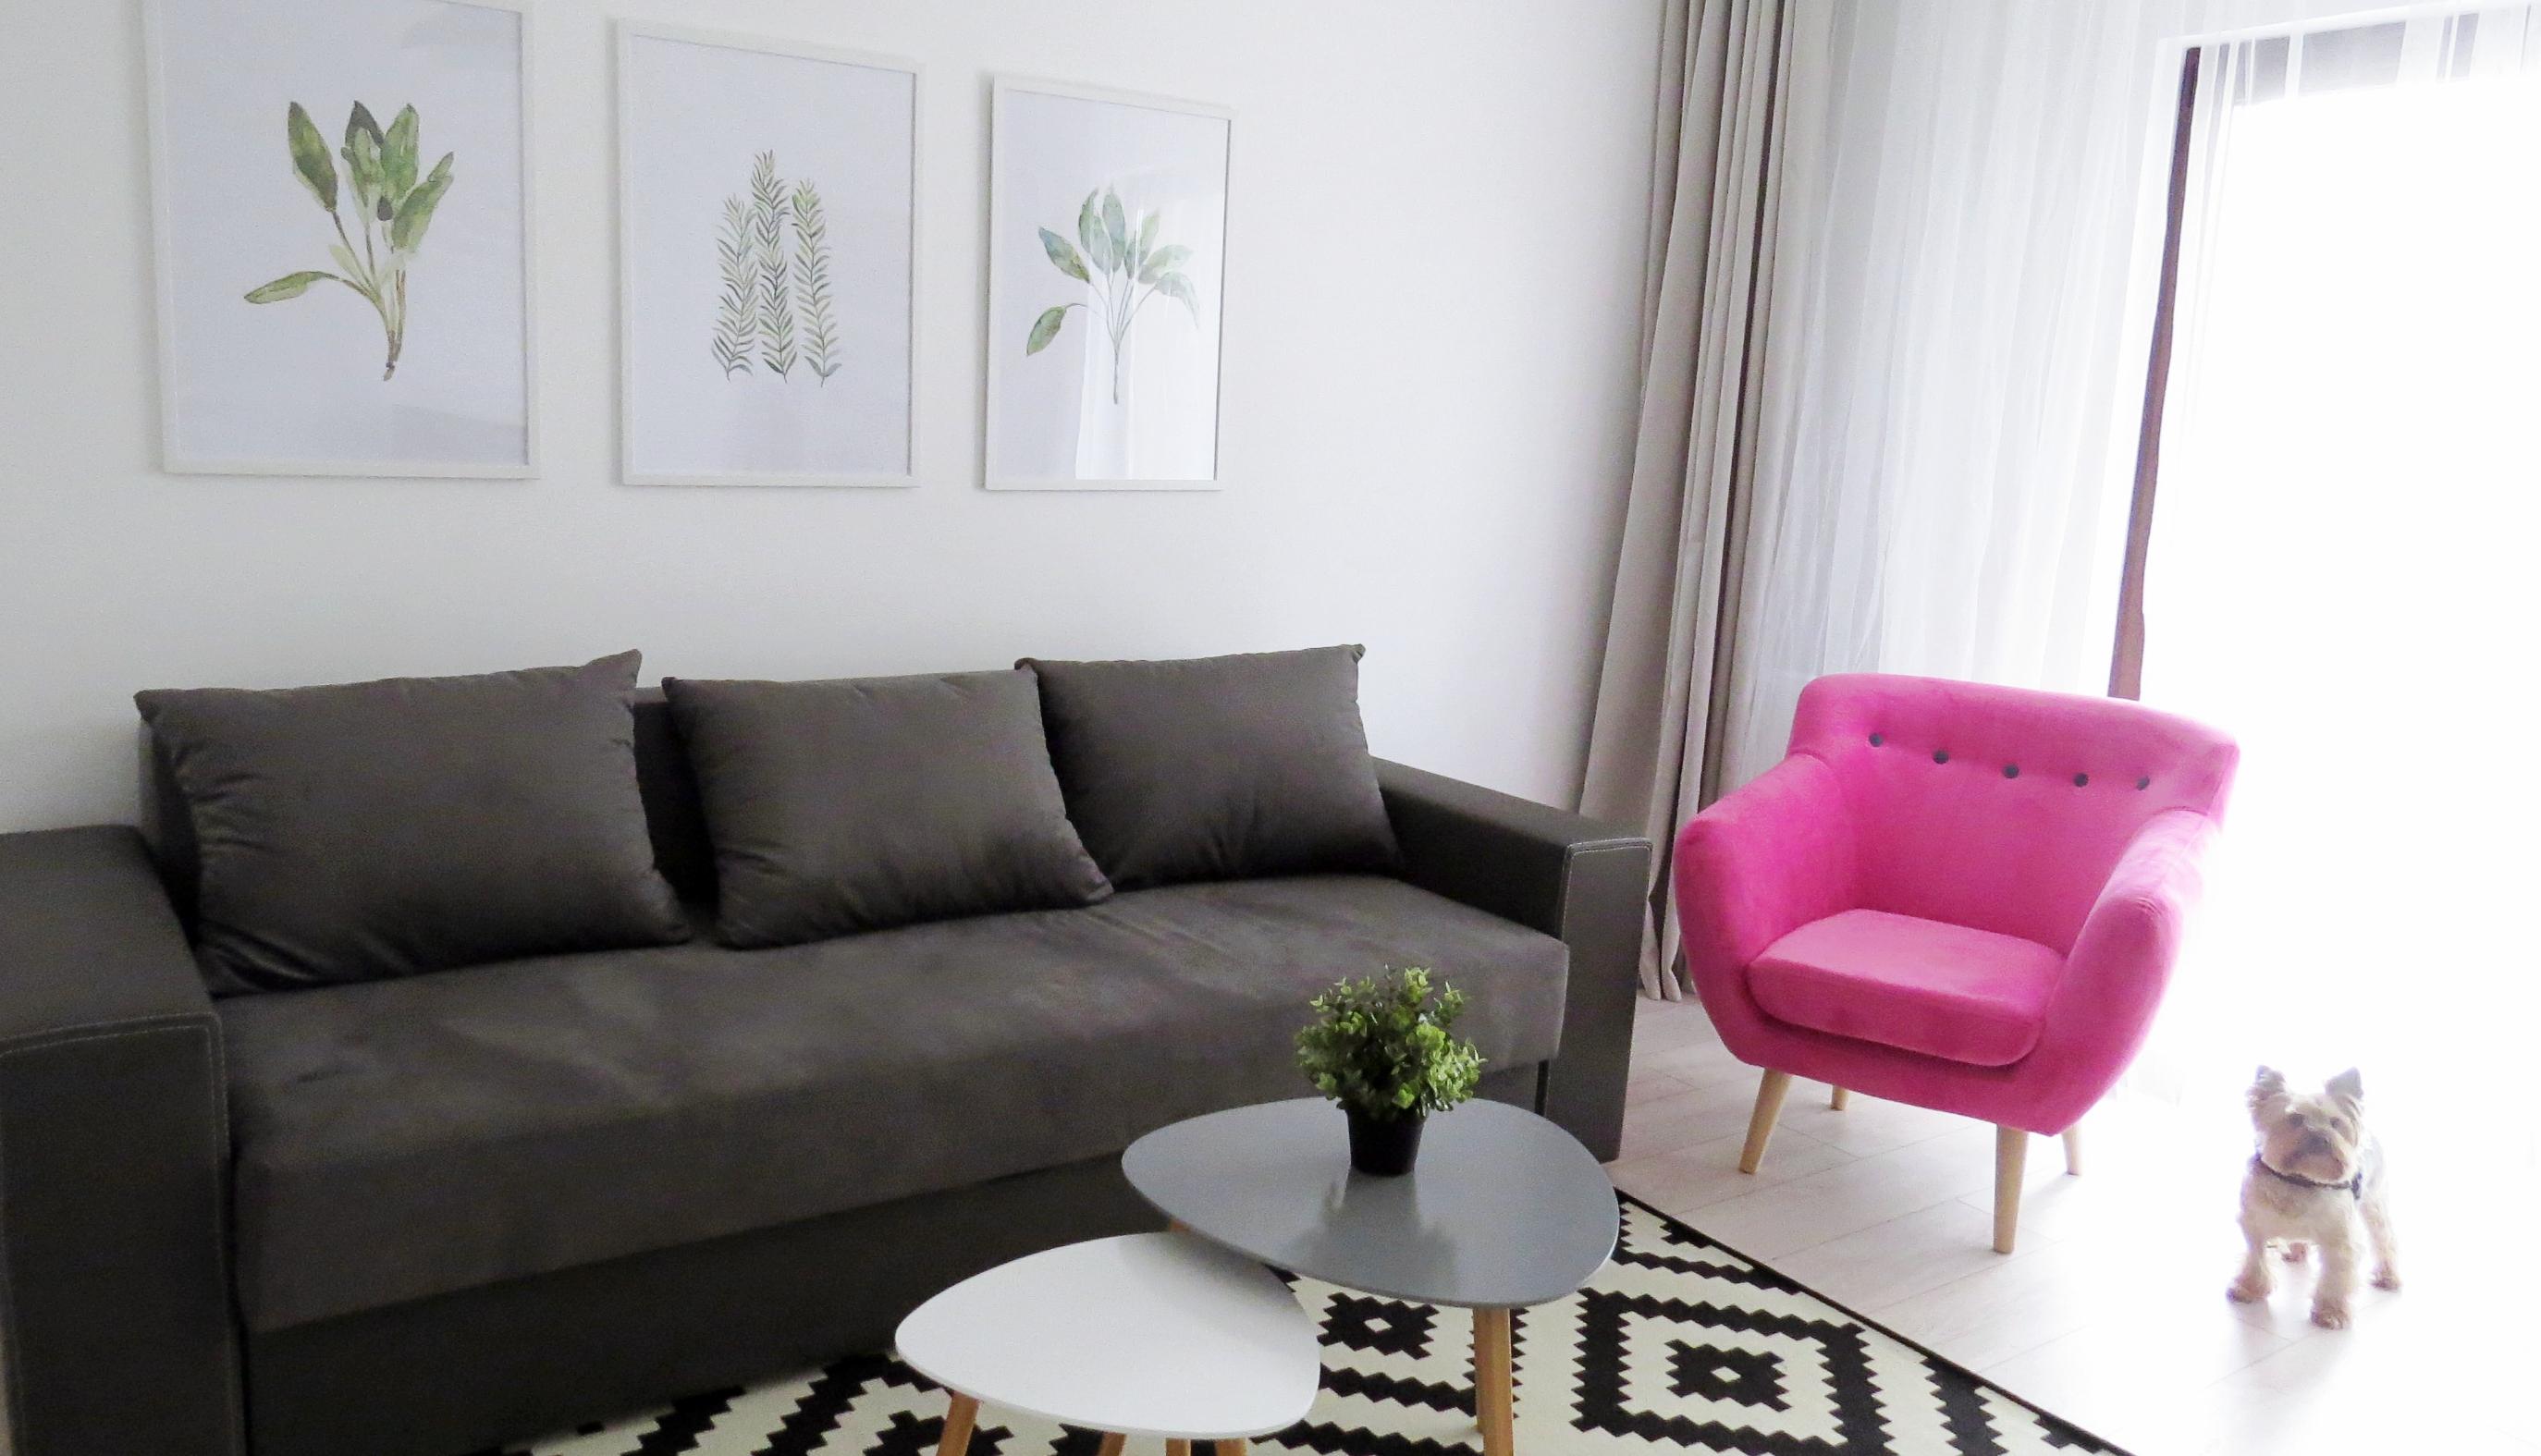 diy home decor leaf